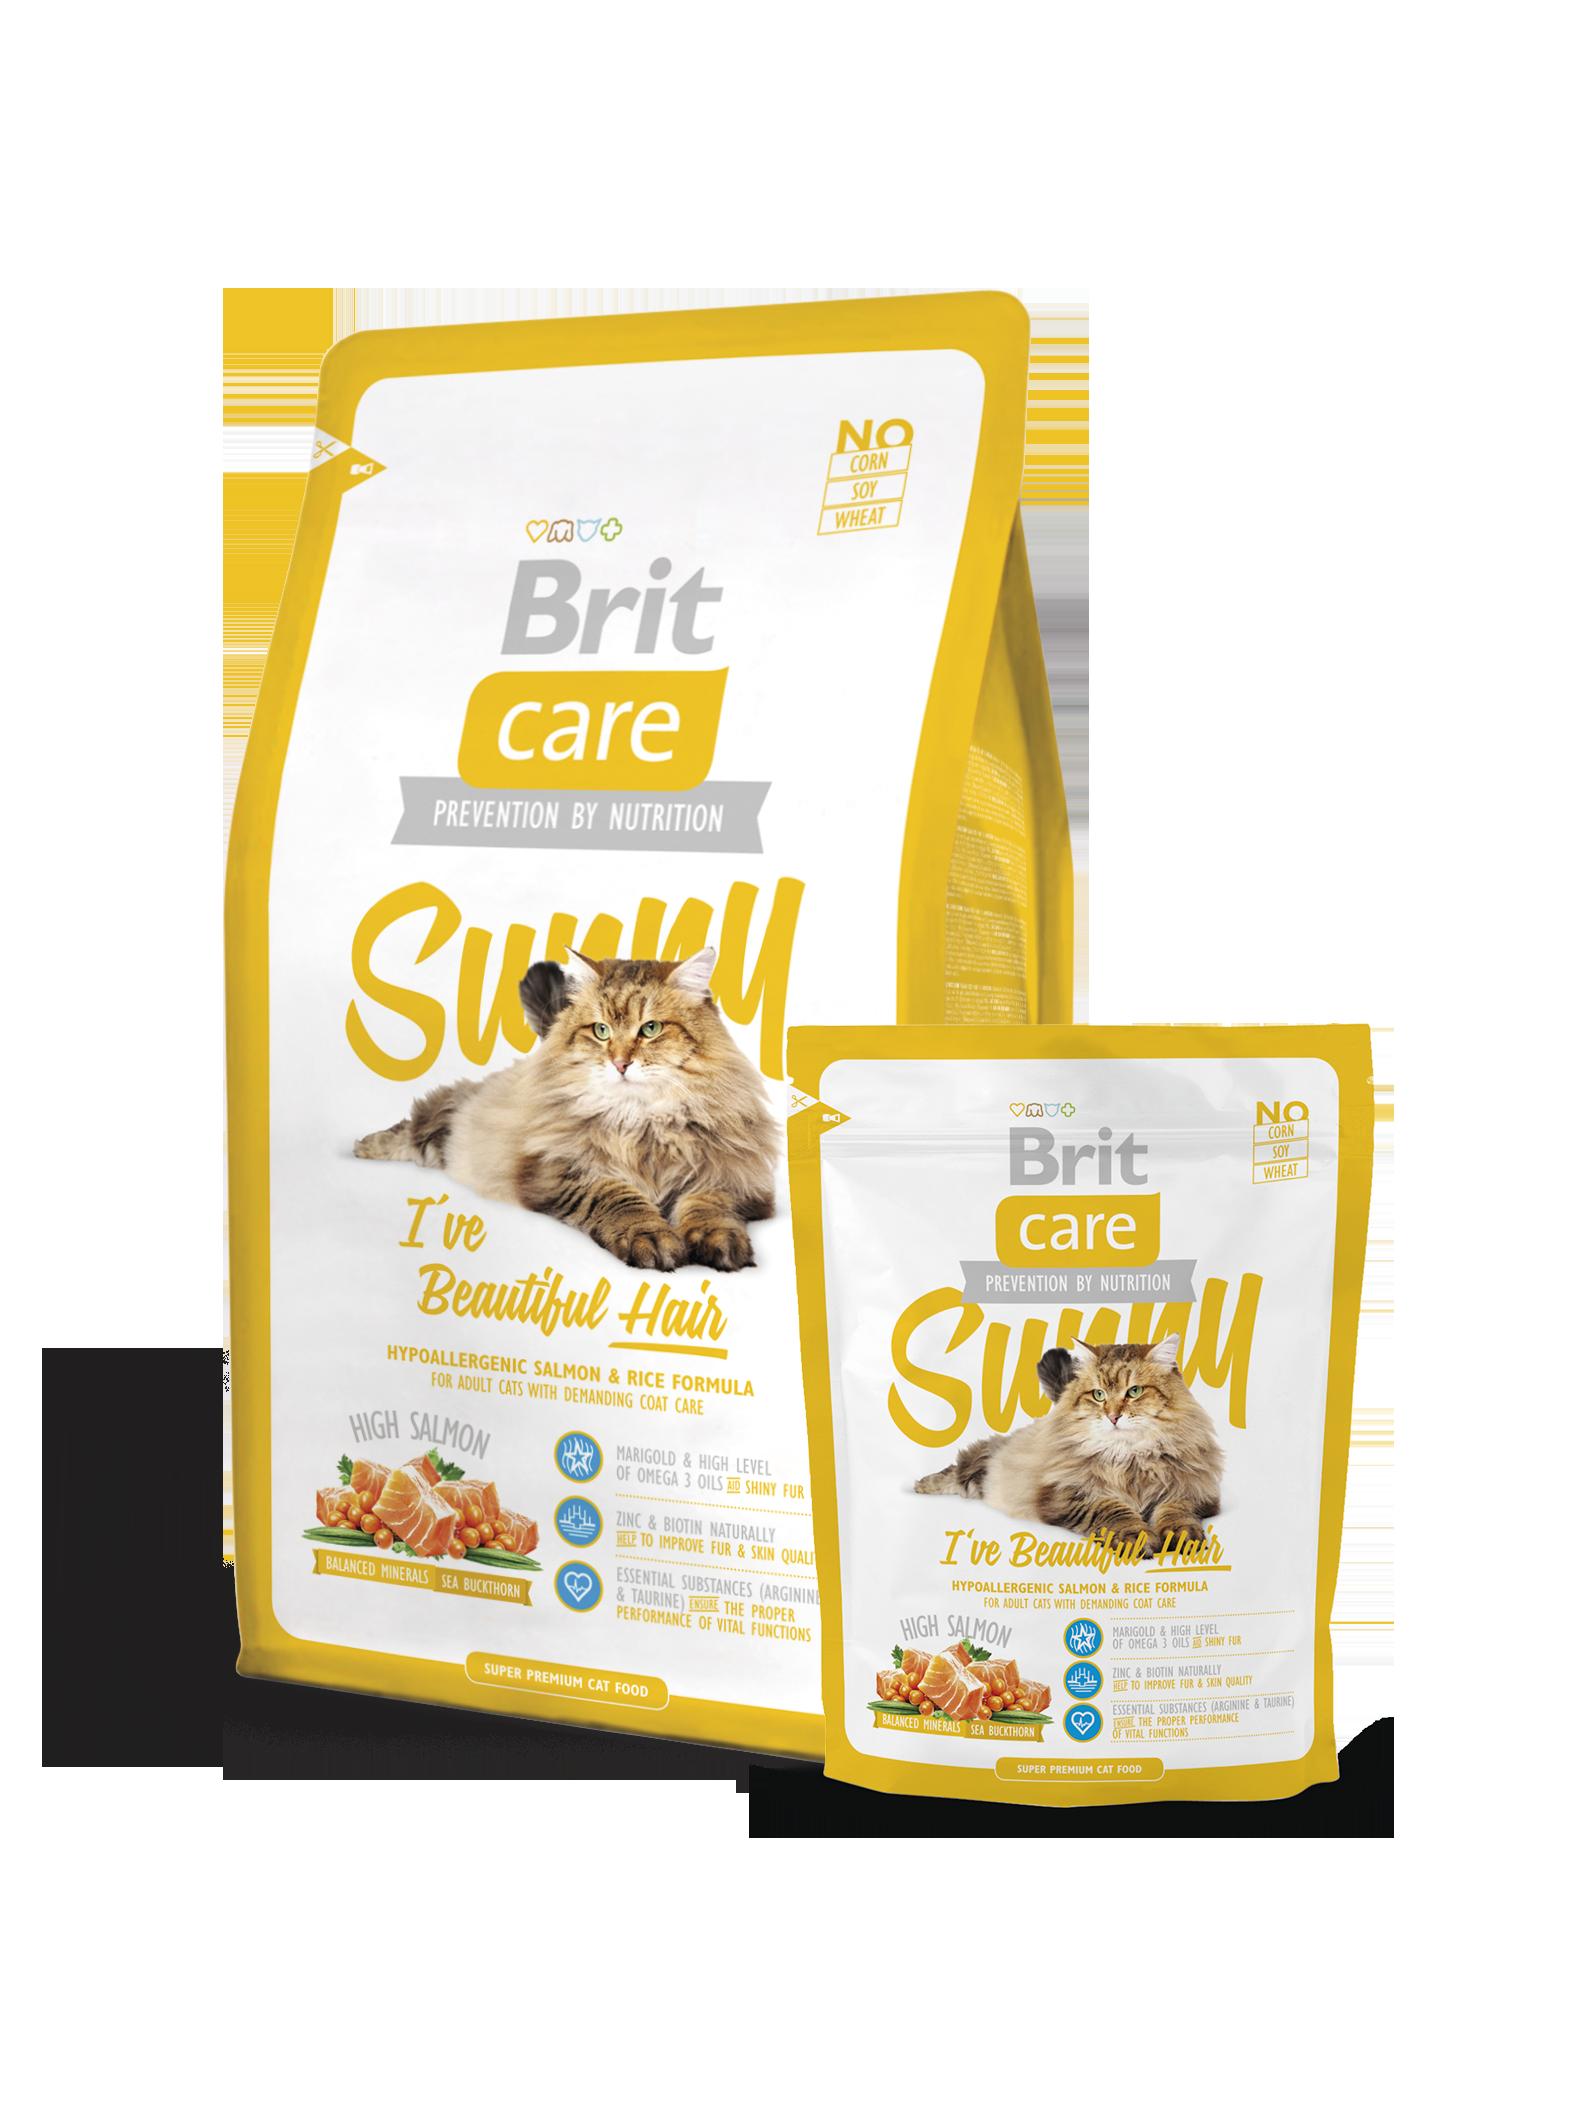 Brit Care Cat Sunny I've Beautiful Hair - Pet Food - Pet Store - Pet supplies